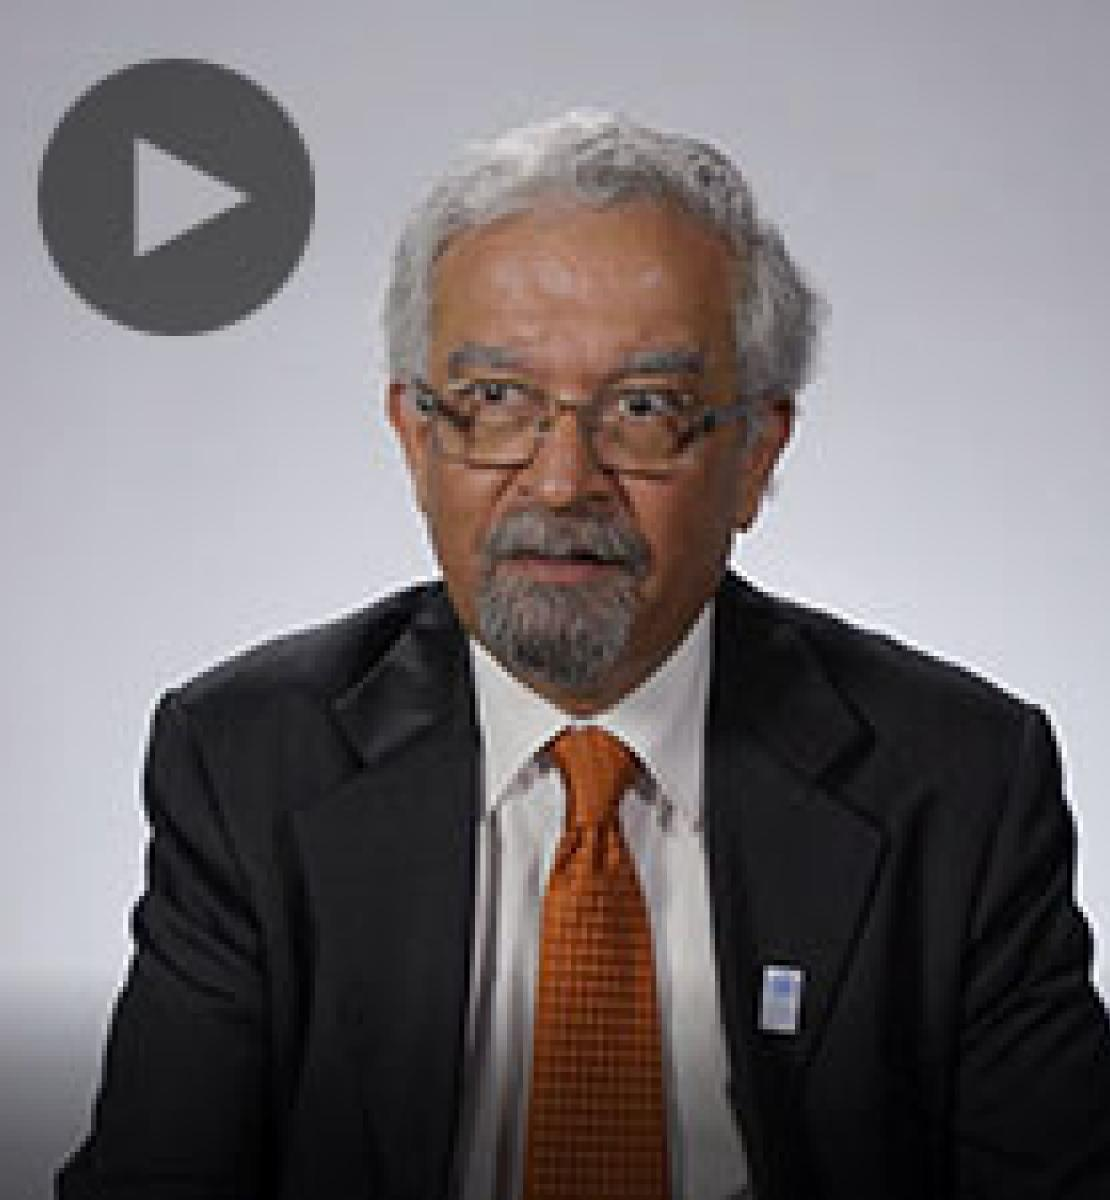 Screenshot from video message shows Resident Coordinator, Kamal Malhotra